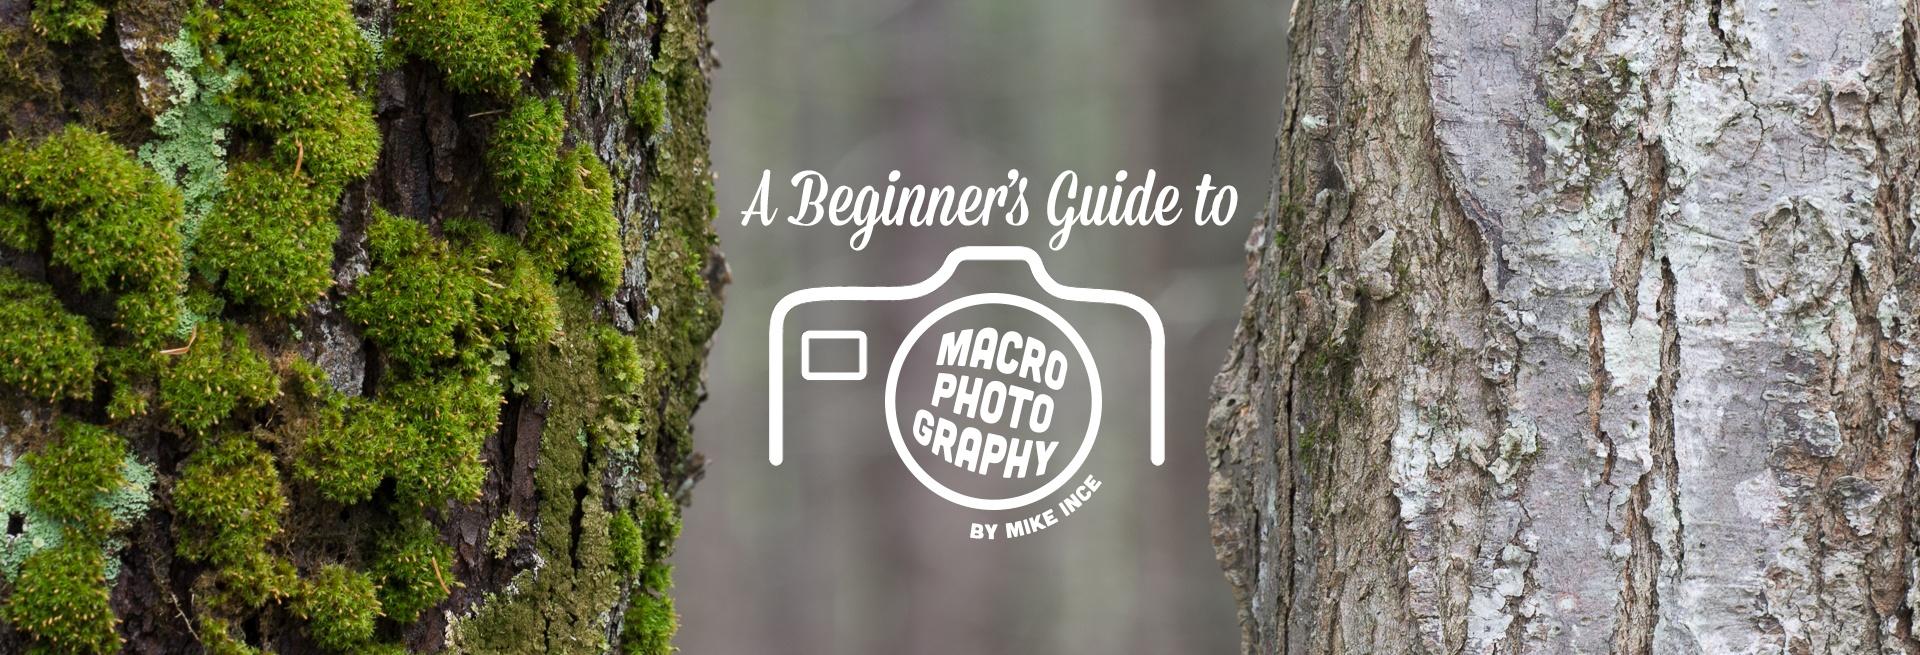 MacroBlog_Header_1.jpg